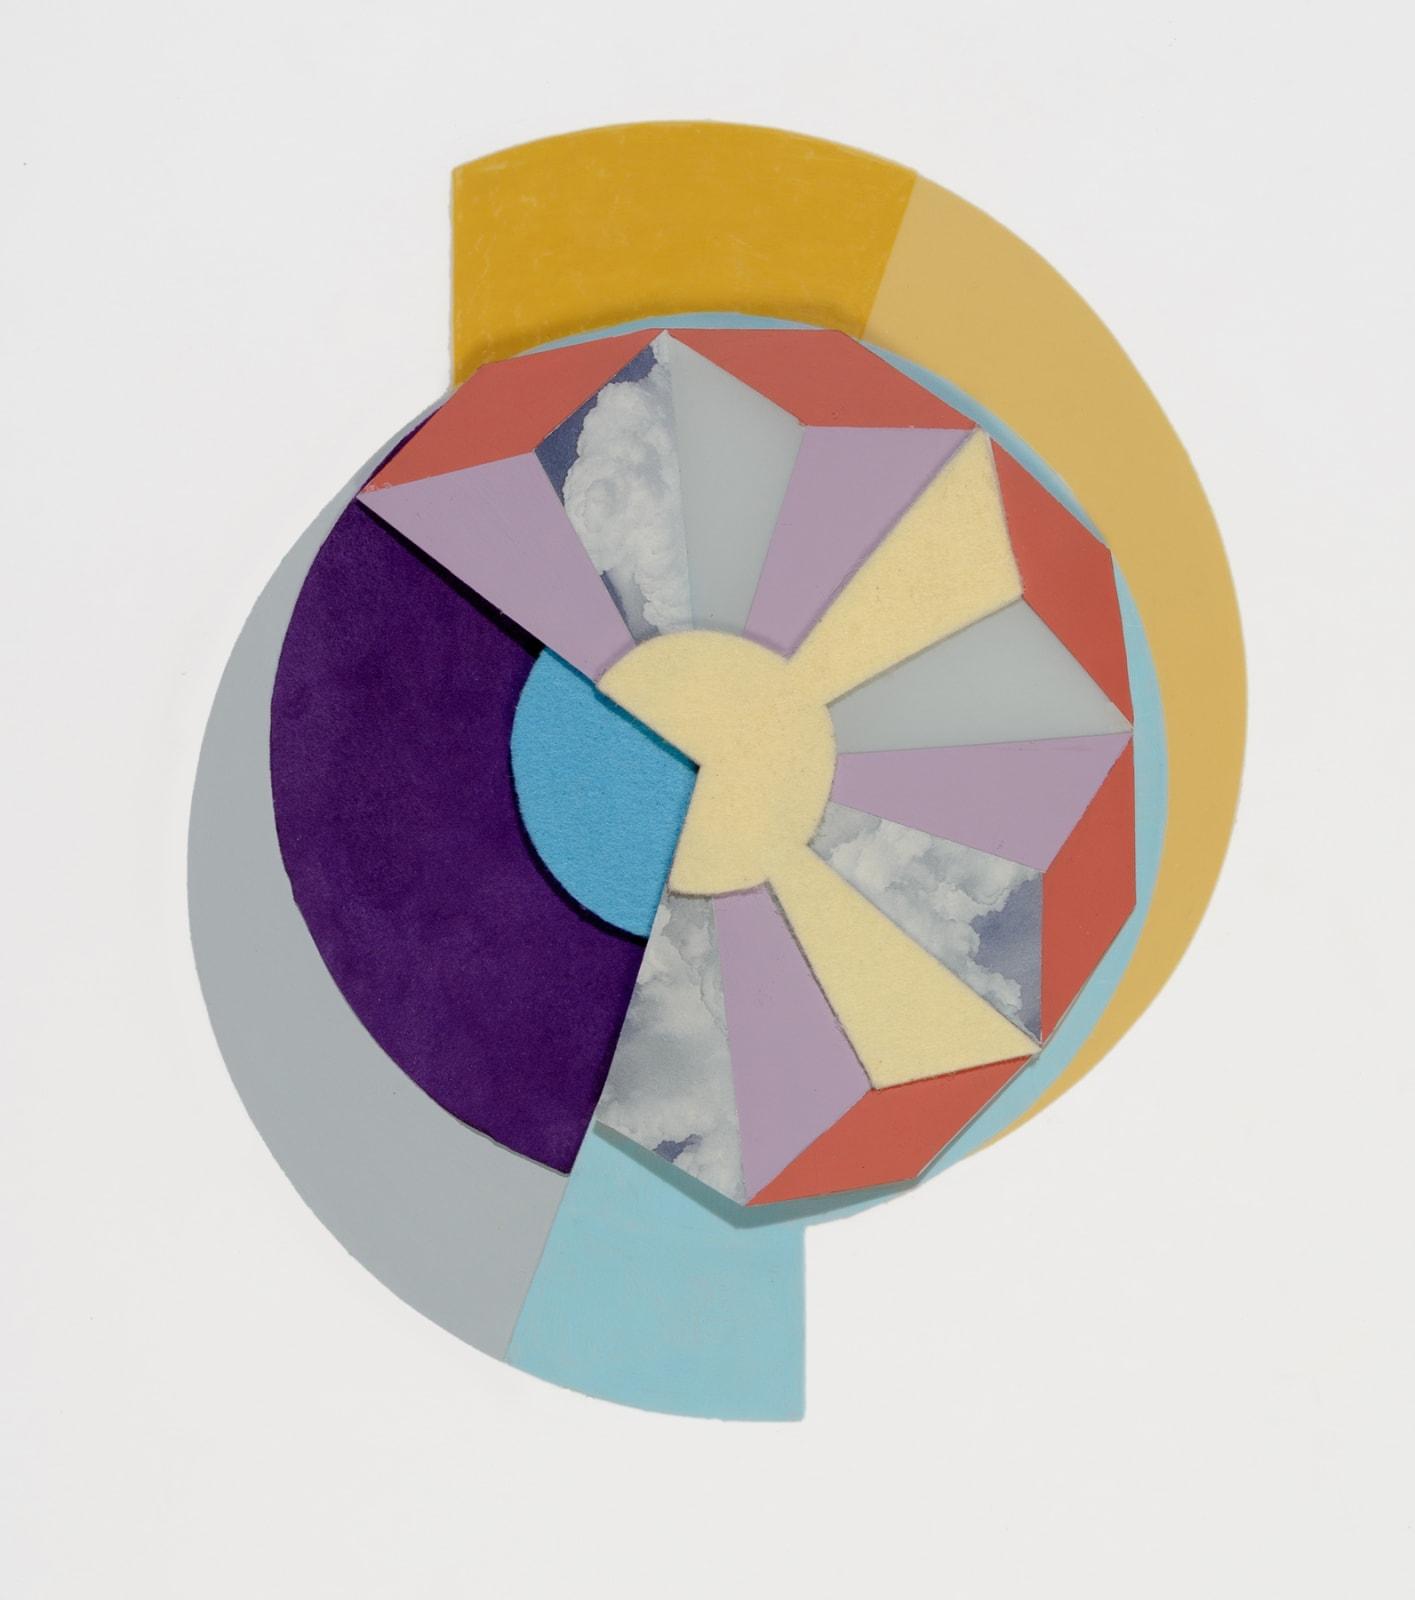 Constance Lowe Sarah's Generous Wheel (Study 2), 2016